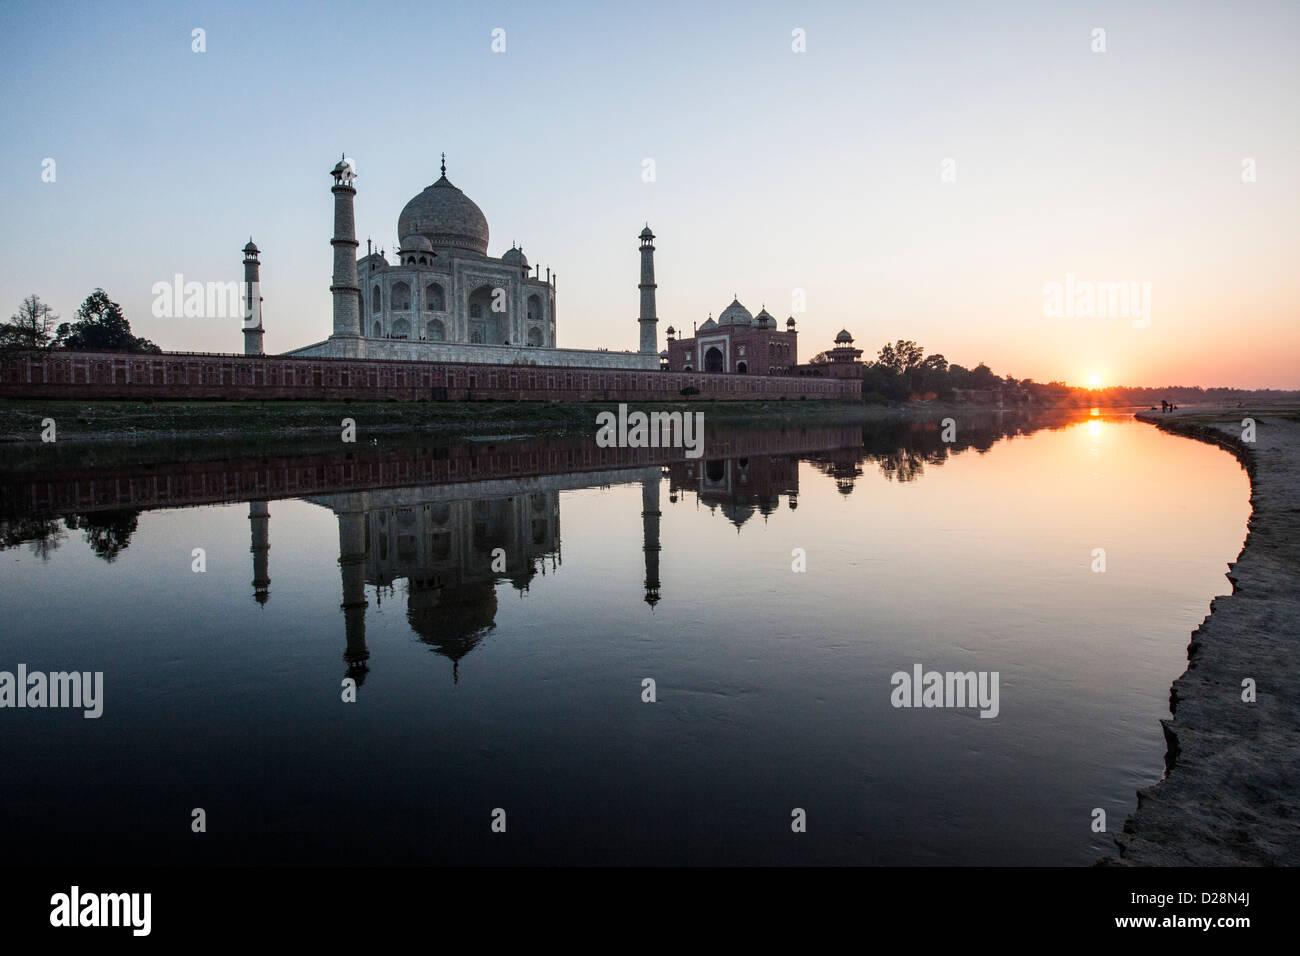 Taj Mahal, Agra India - Stock Image